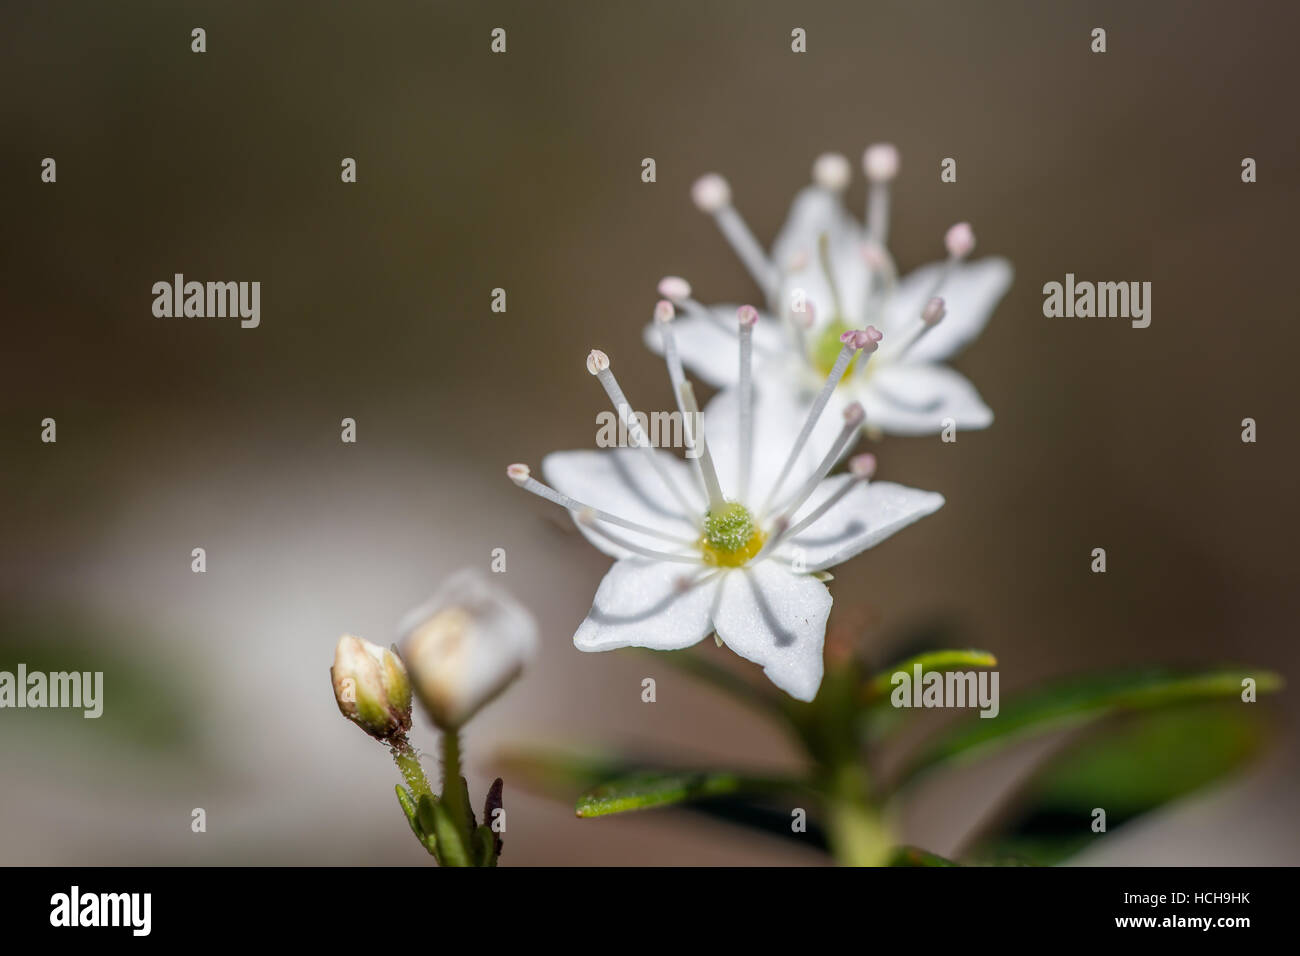 Long White Stamen Stock Photos Long White Stamen Stock Images Alamy